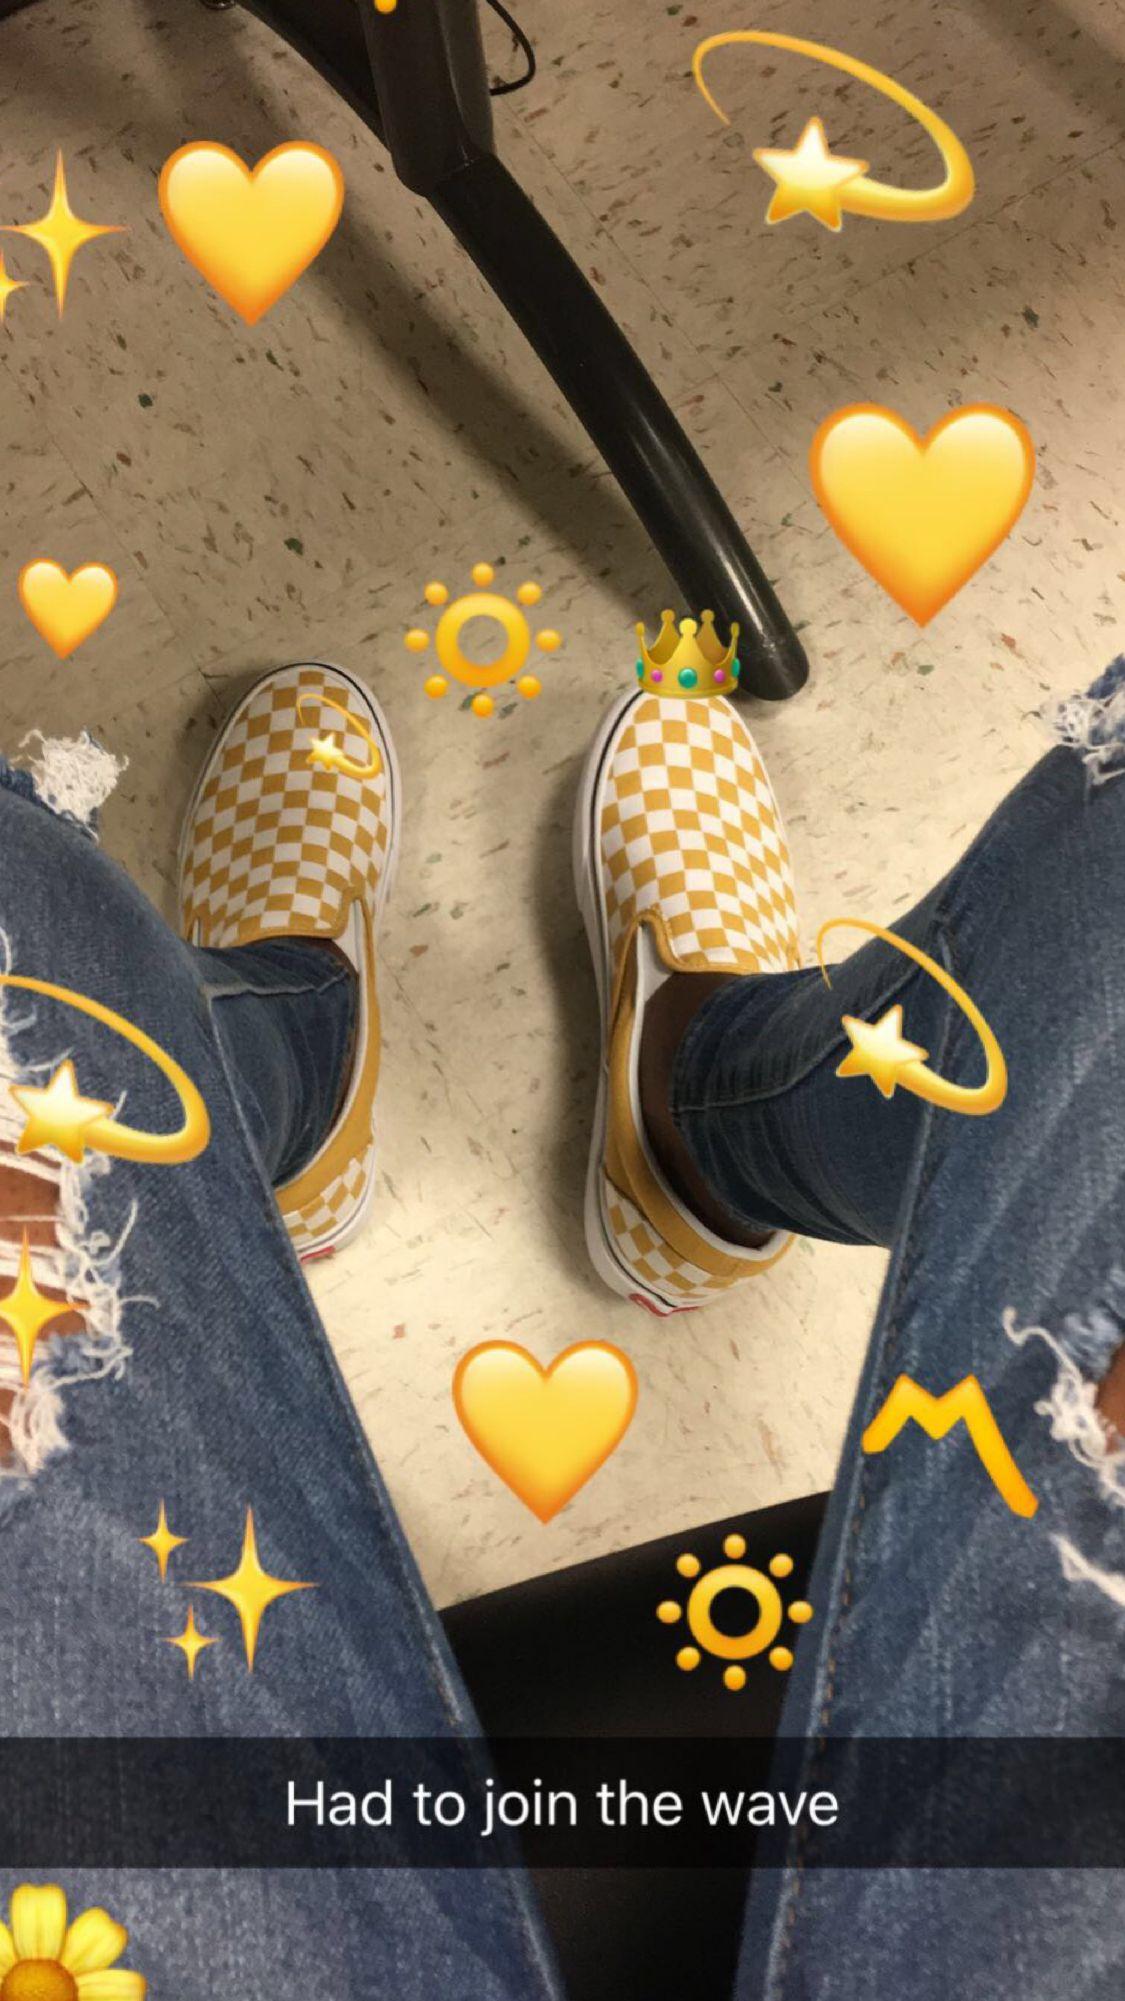 I Finally Got Them Yellow Vans Yellow Slip On Vans Checkered Vans Outfit